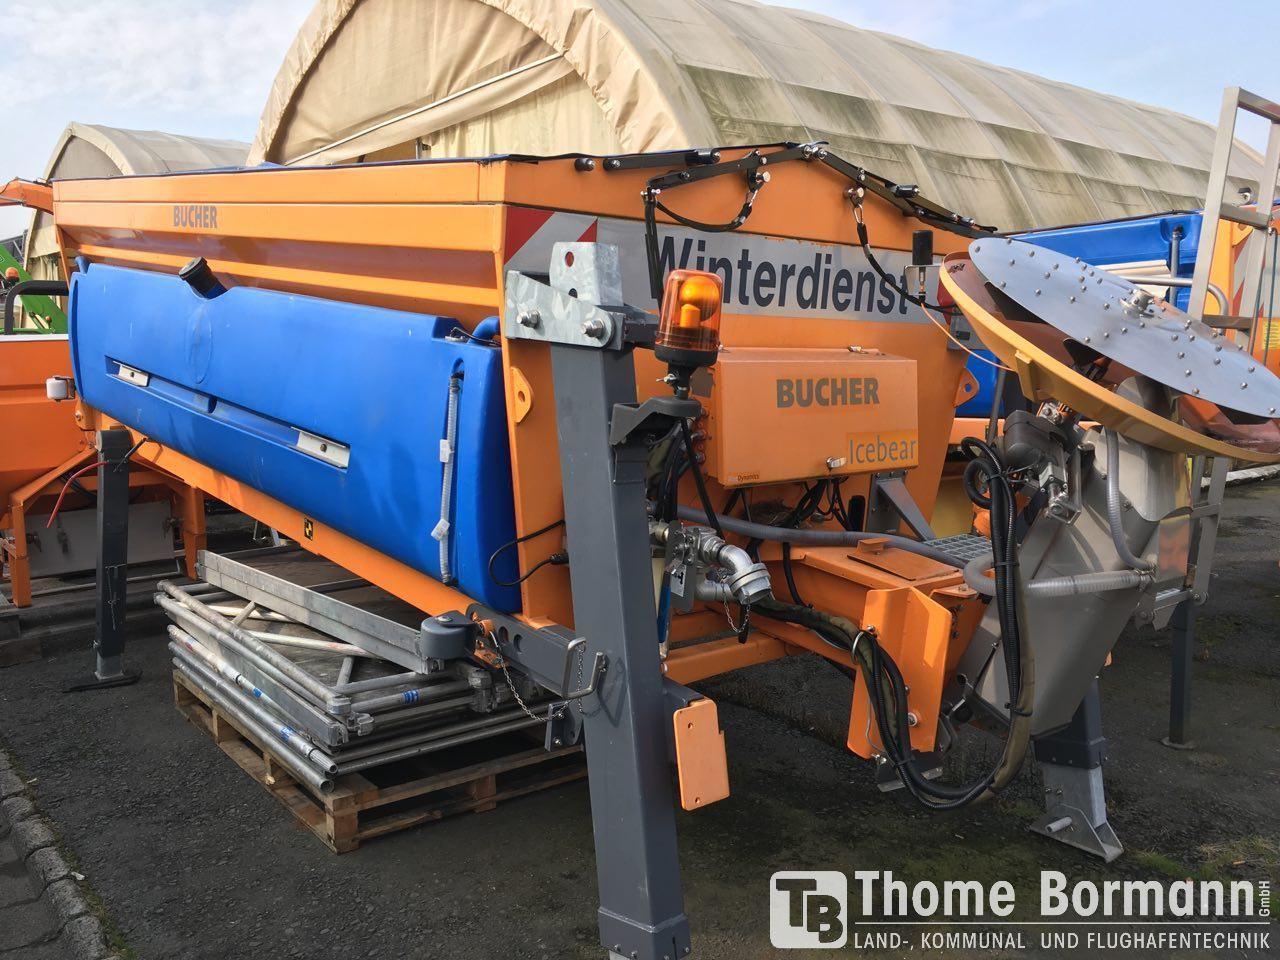 Bucher - GMeiner - Giletta - Assaloni - McDonald Icebear L 5000 V